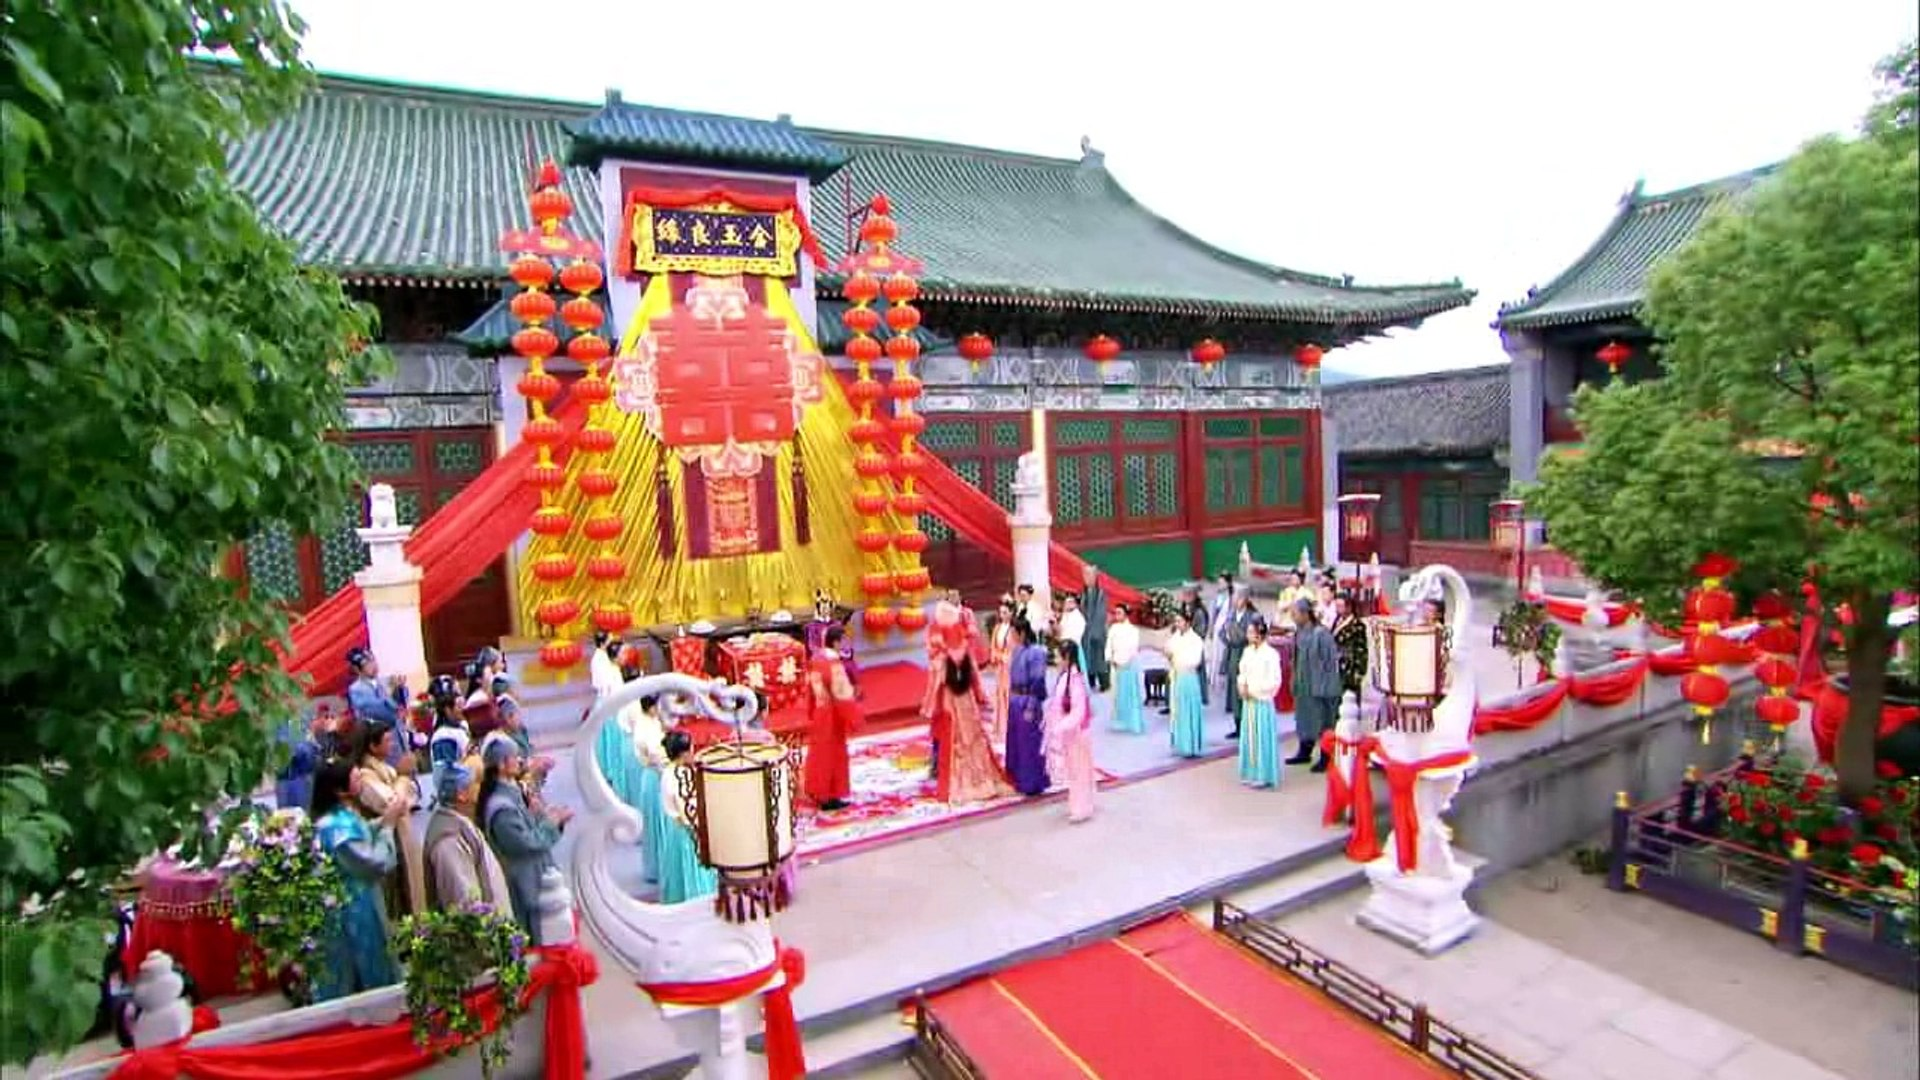 matchmaking Temple à Singapour Speed datation Fermanagh